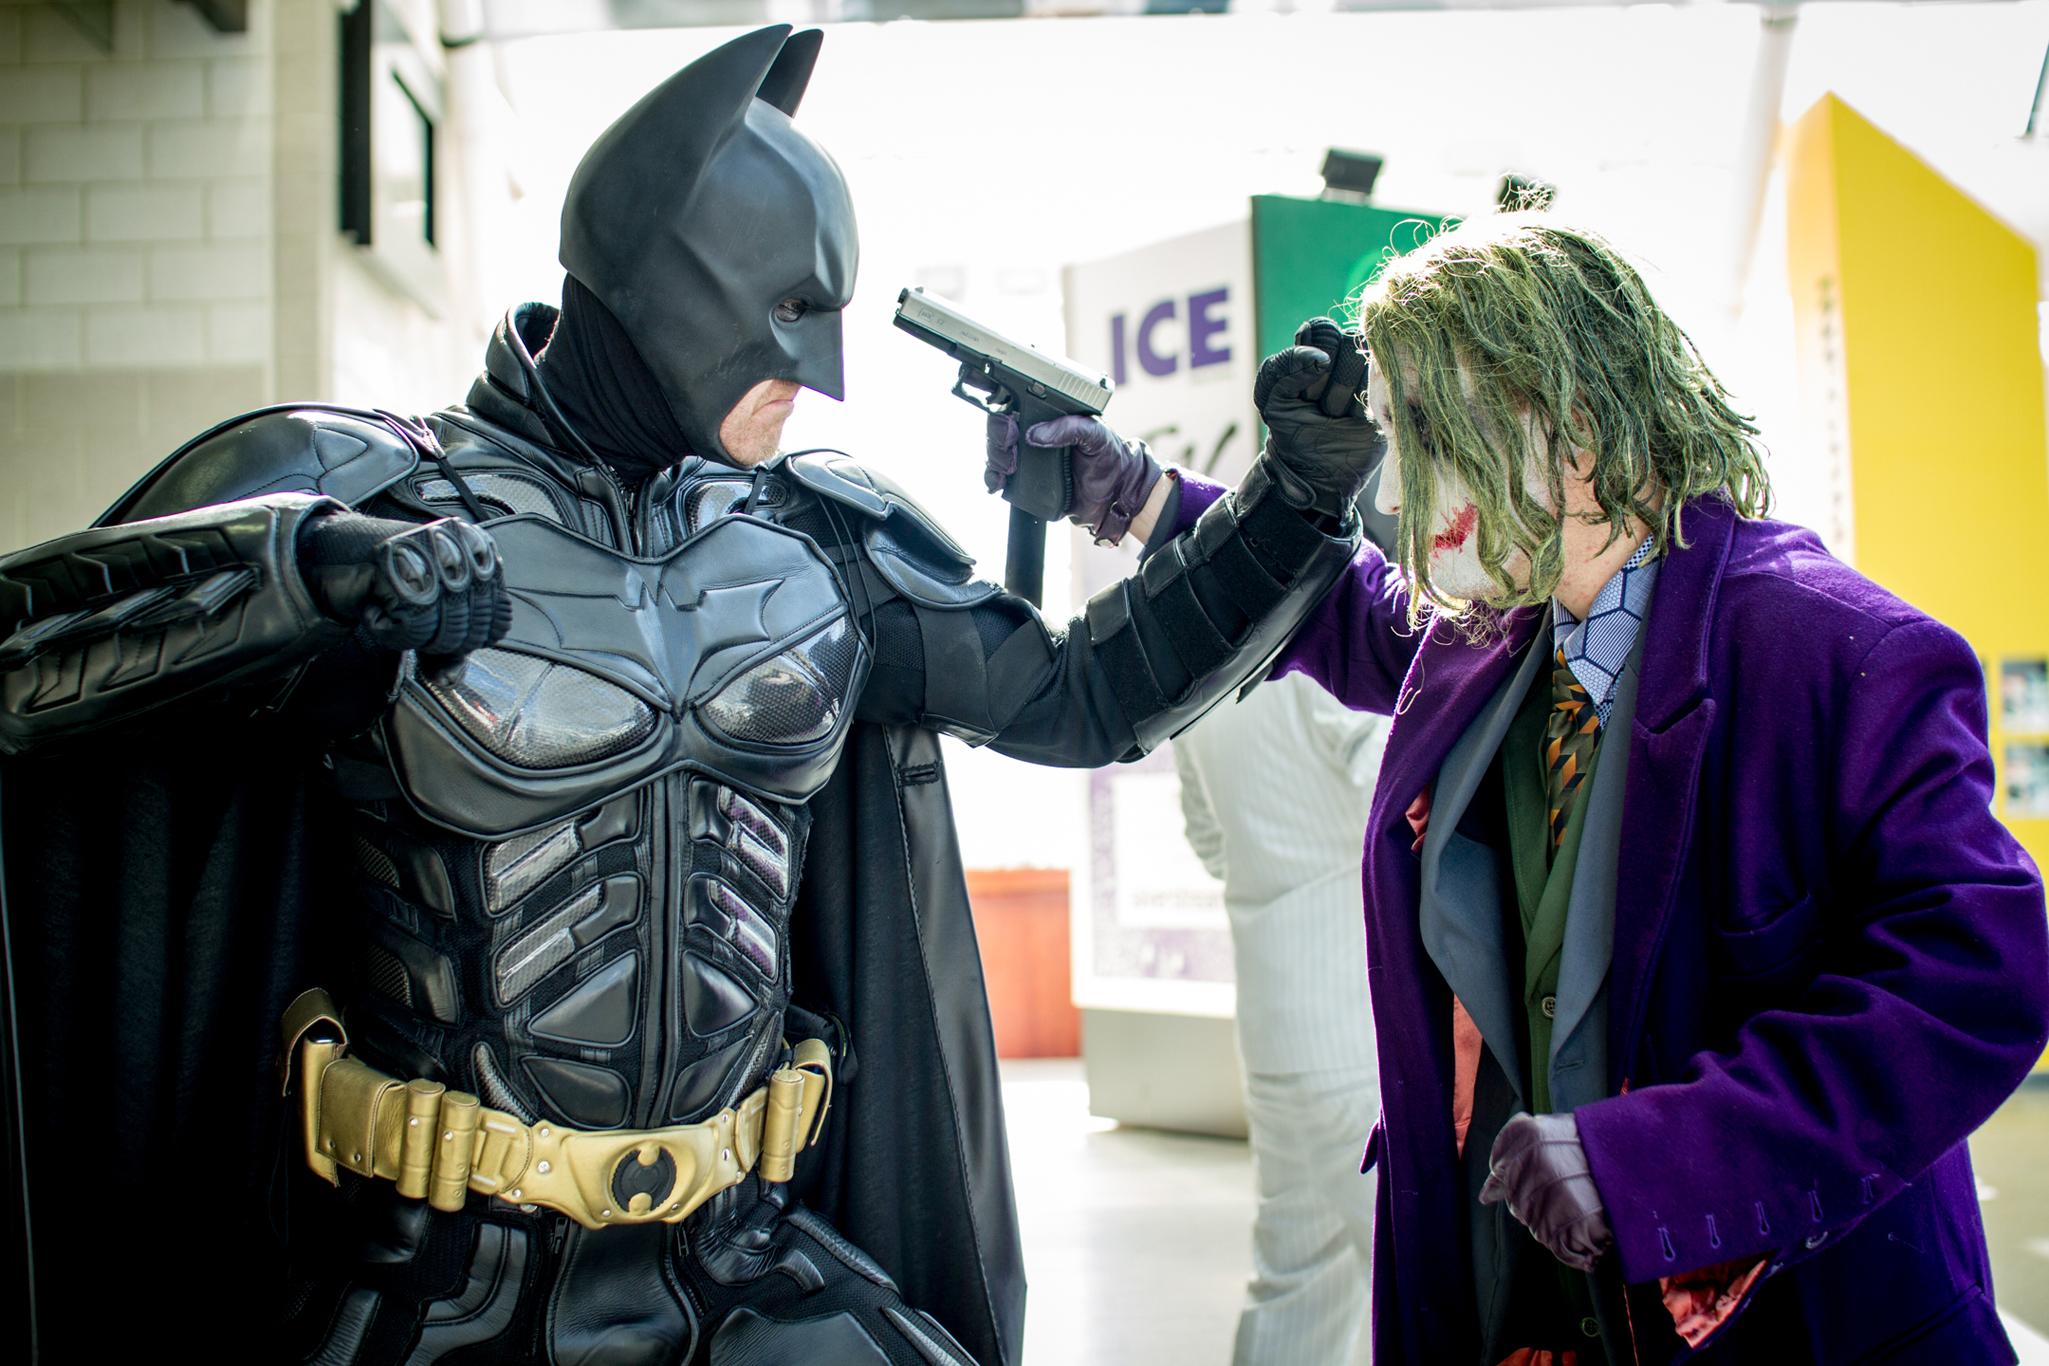 Batman and Joker cosplay at London Super Comic Convention